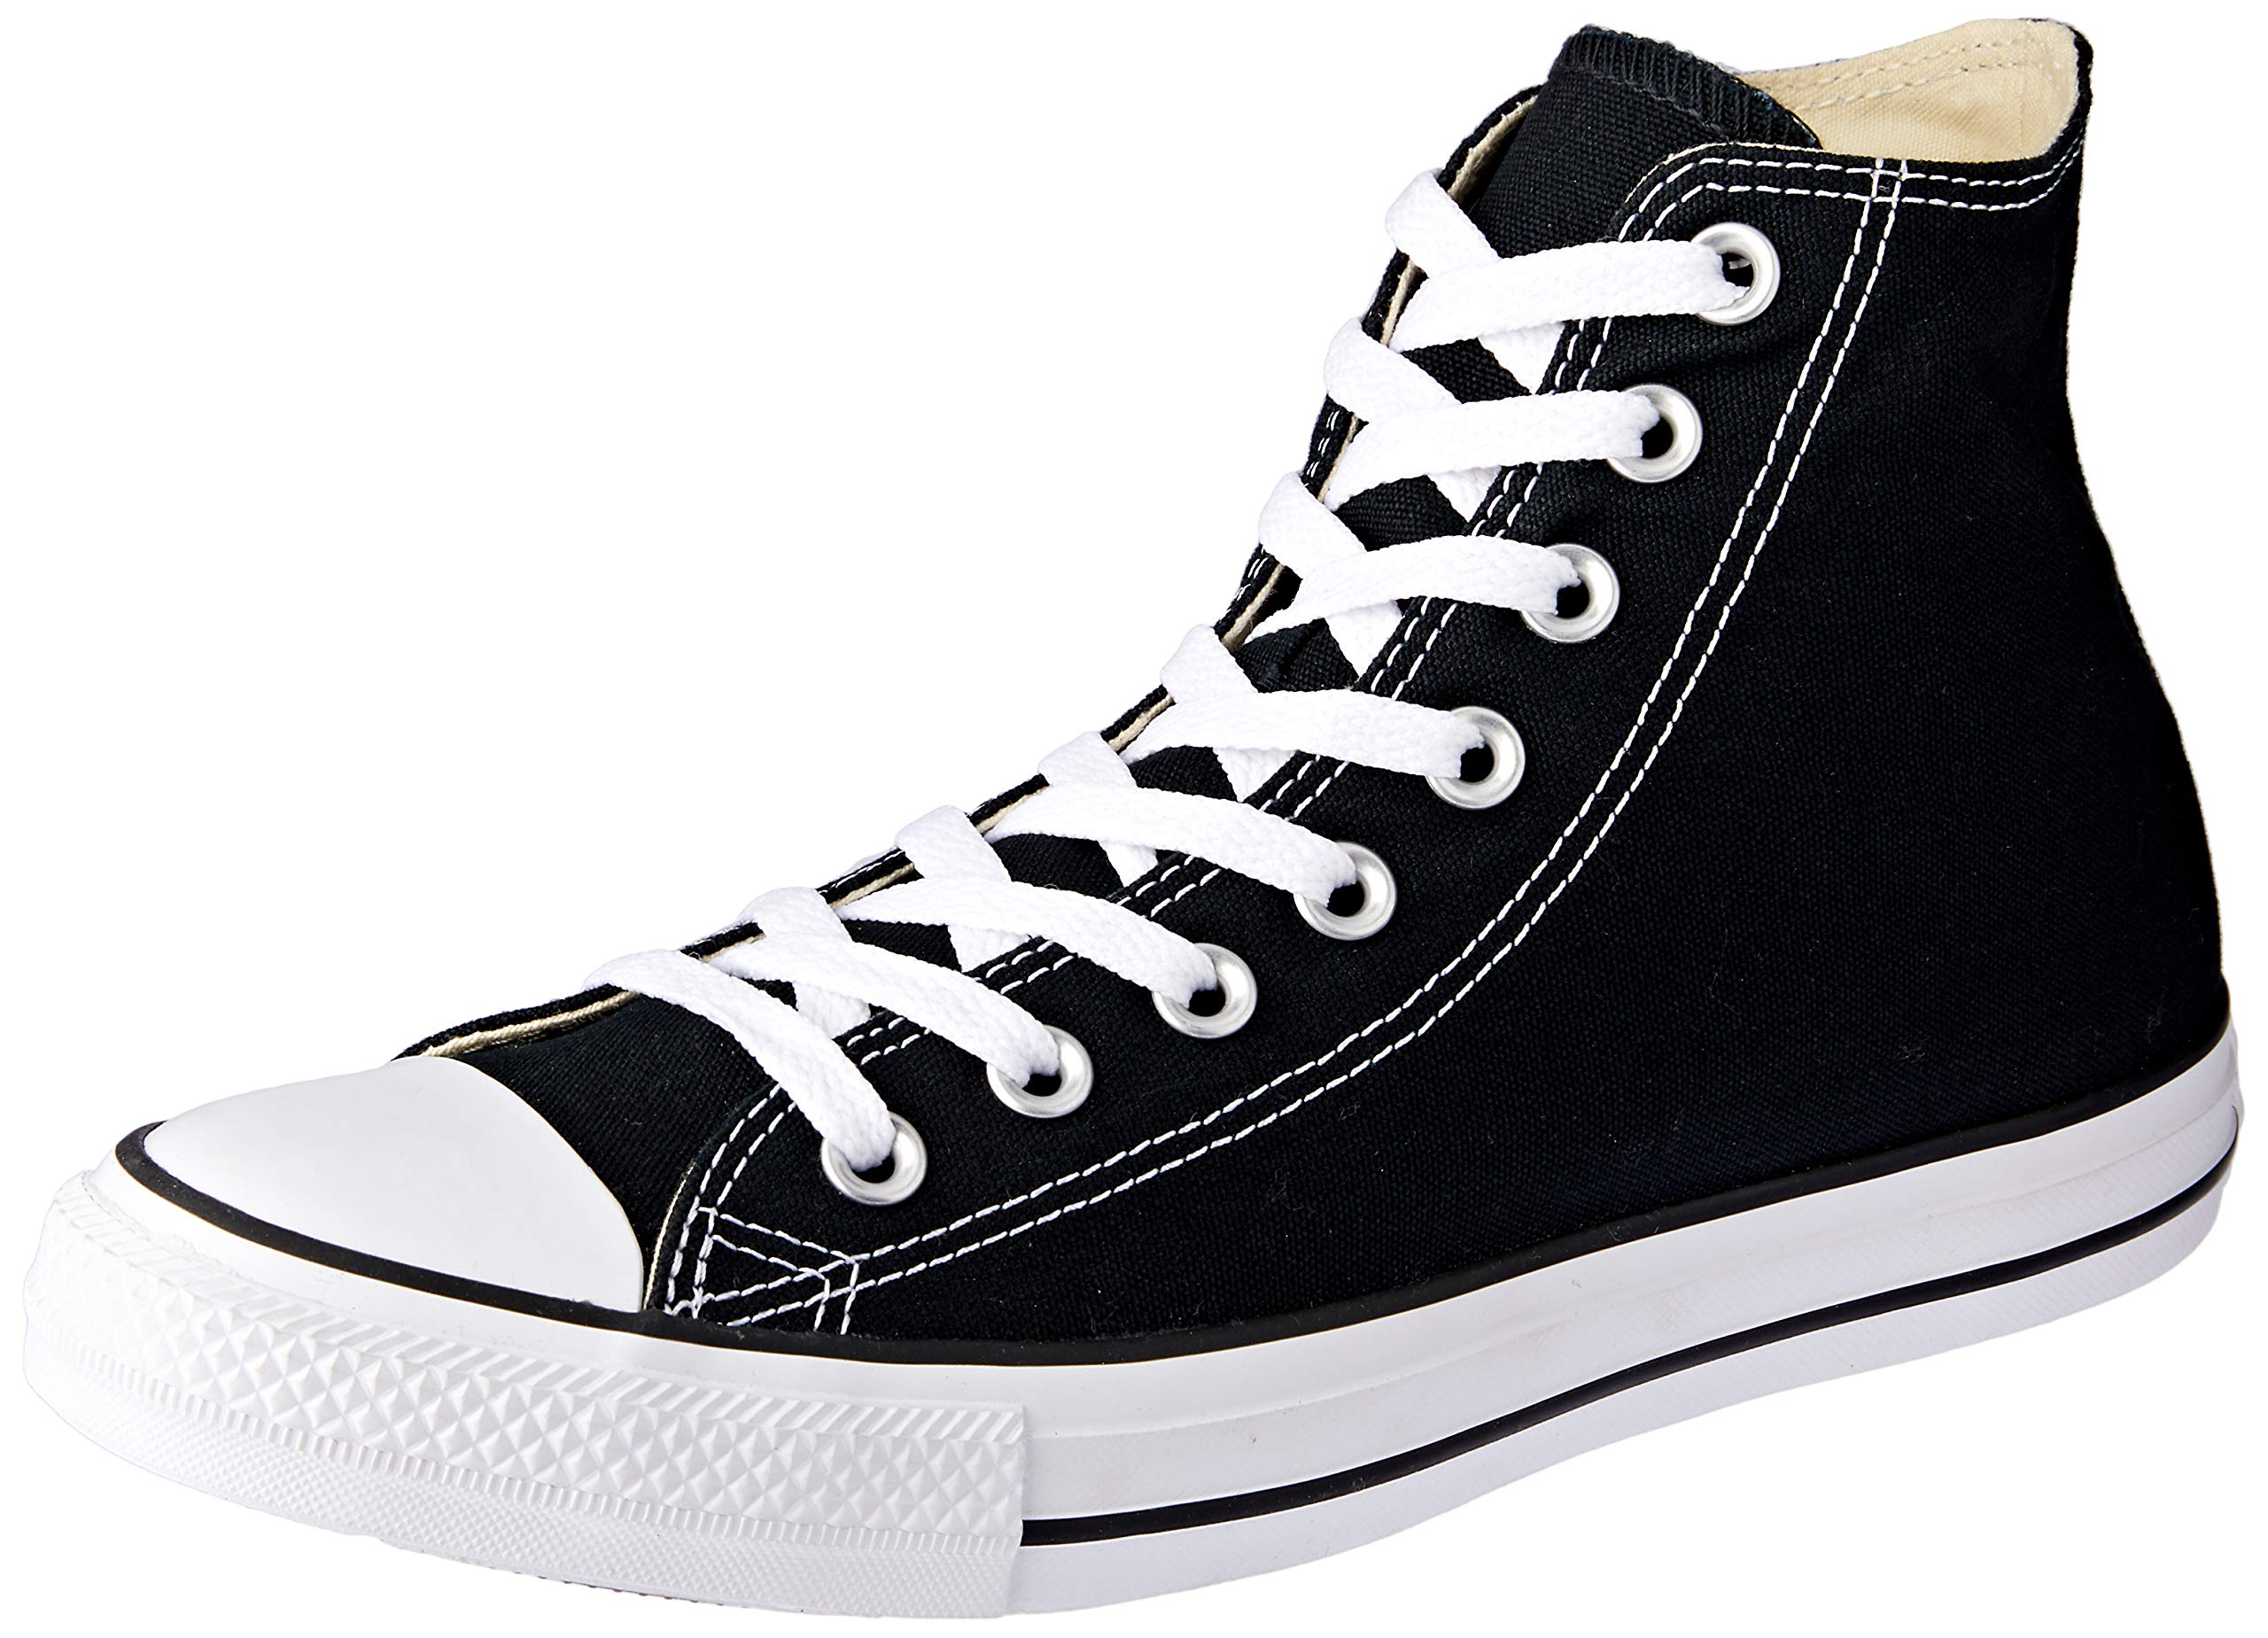 converse chuck taylor all star high top black